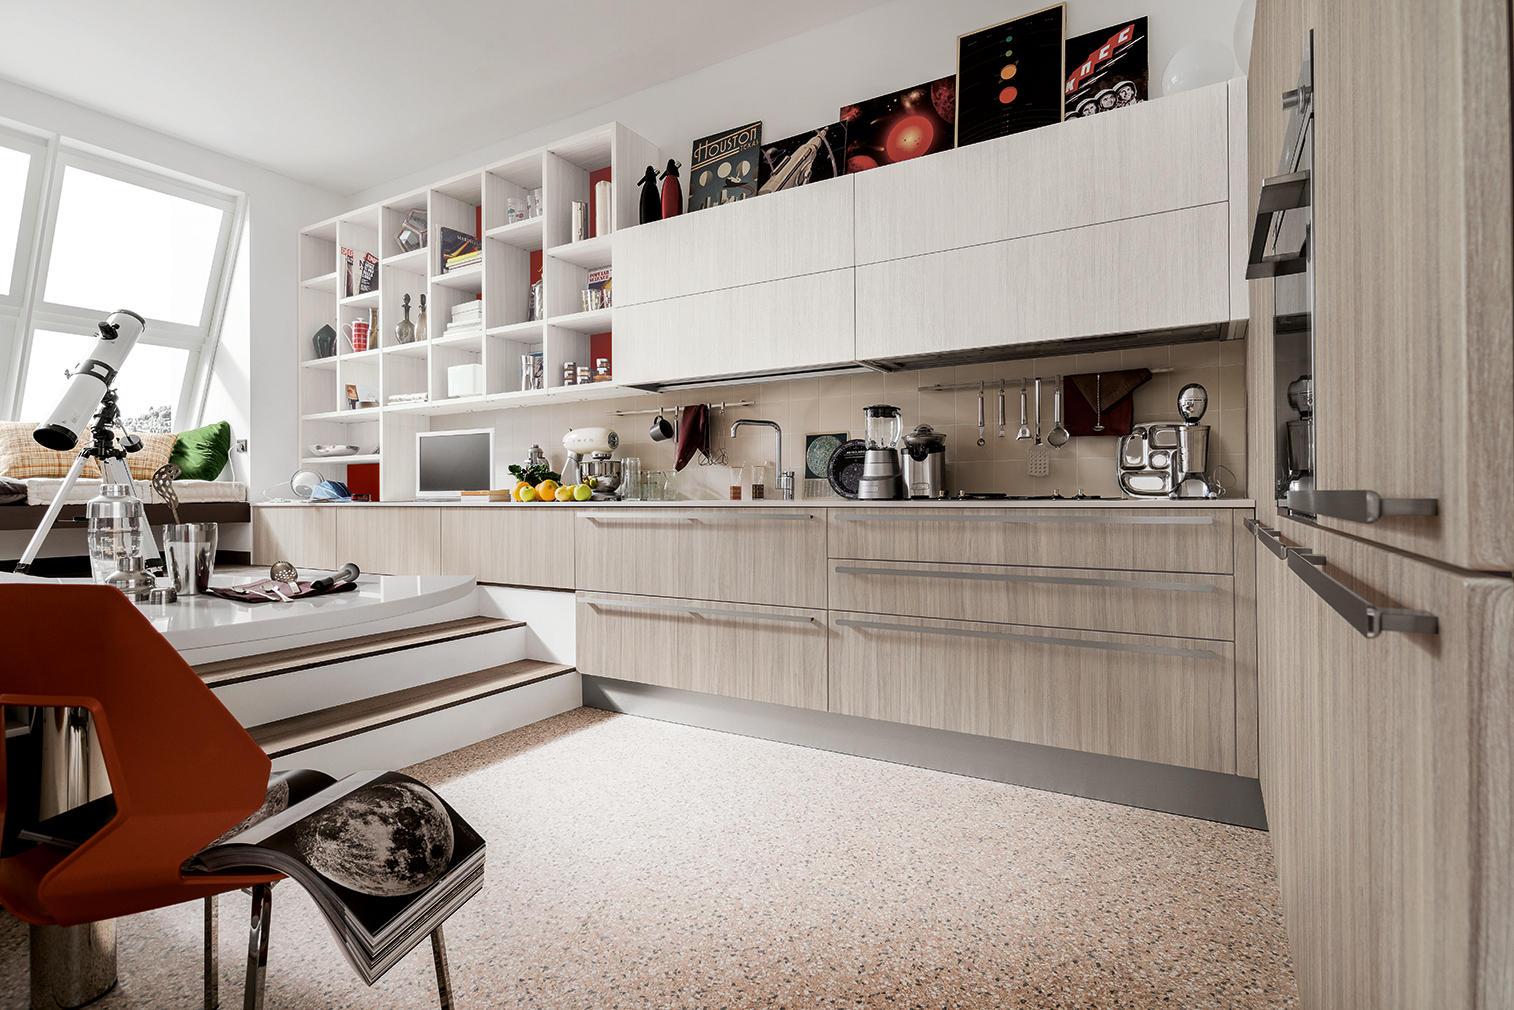 Veneta Cucine Carrera.Carrera Fitted Kitchens From Veneta Cucine Architonic